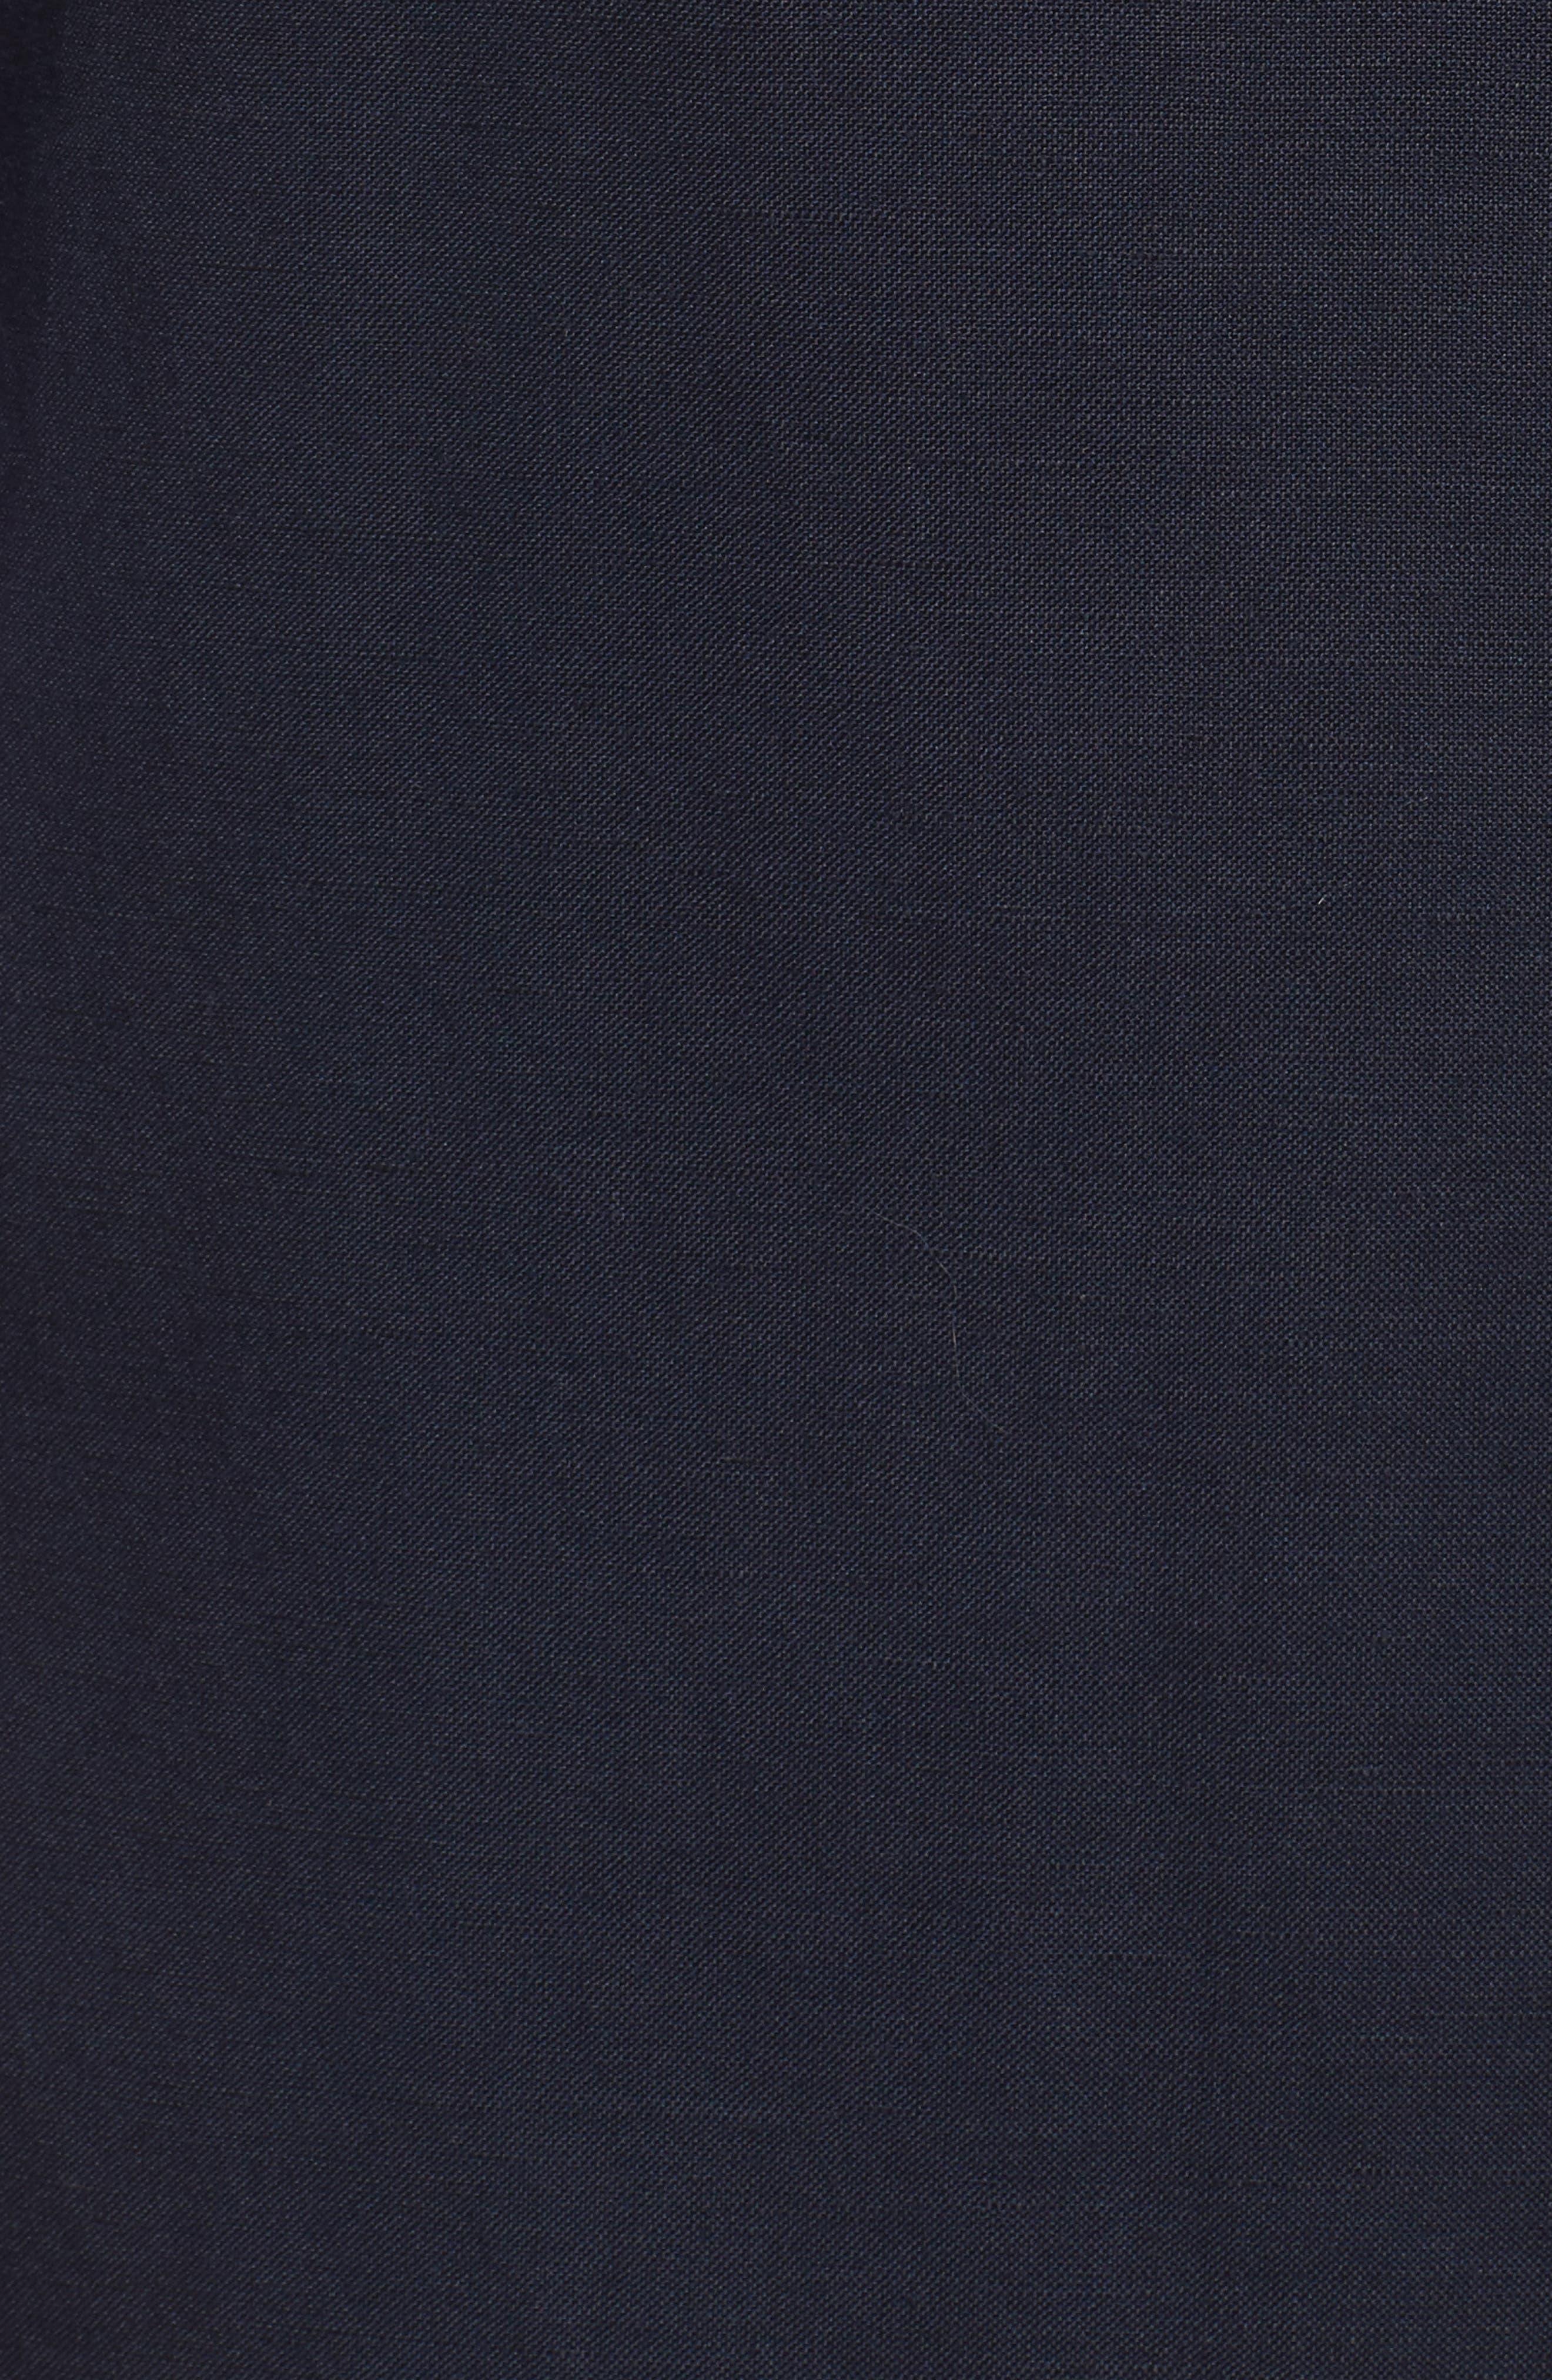 Mandarin Collar Shift Dress,                             Alternate thumbnail 5, color,                             Navy/ Pansy